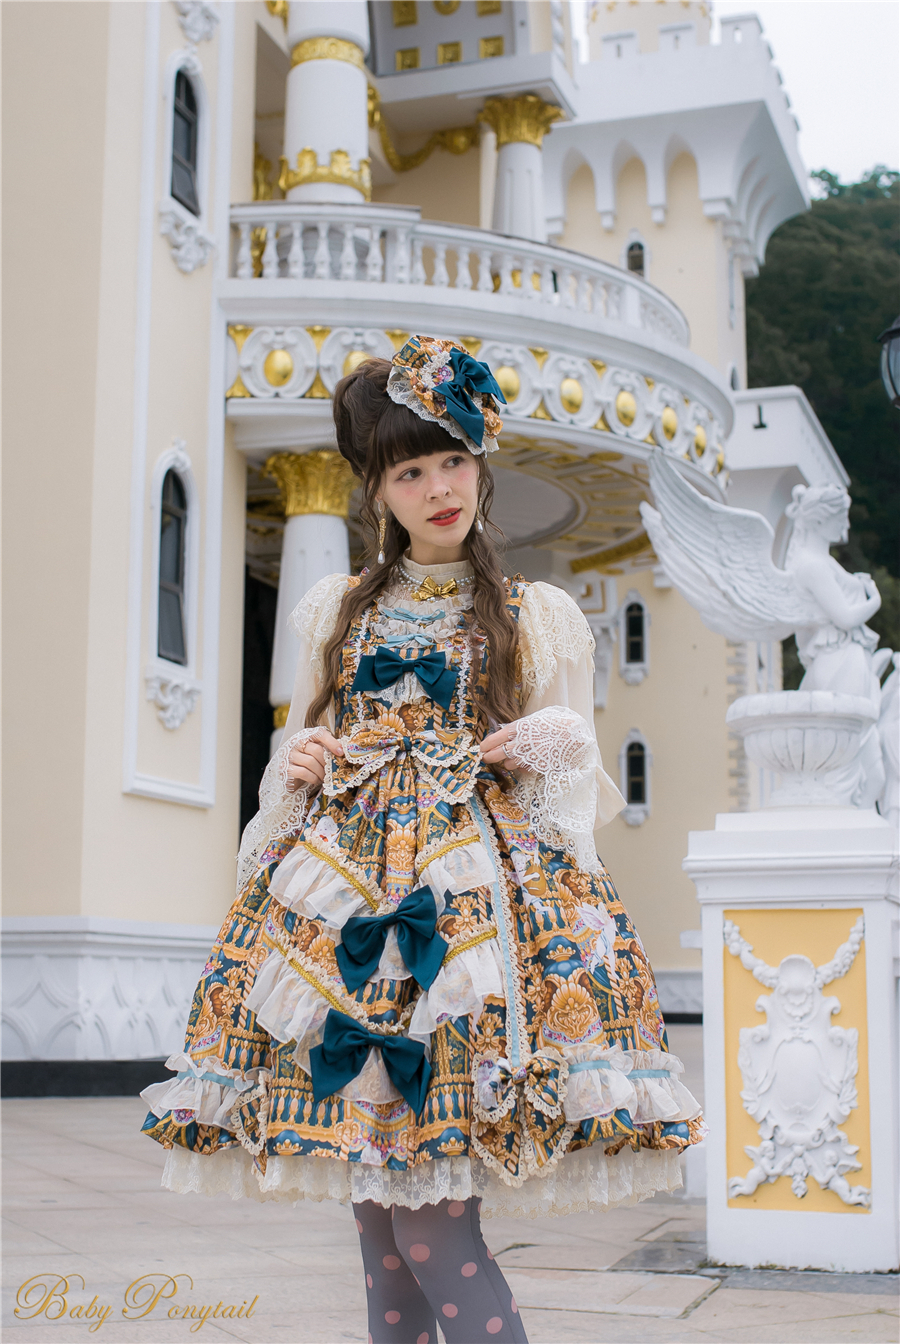 Babyponytail_Model_JSK_Tiel Present Angel_Claudia_2_06.jpg